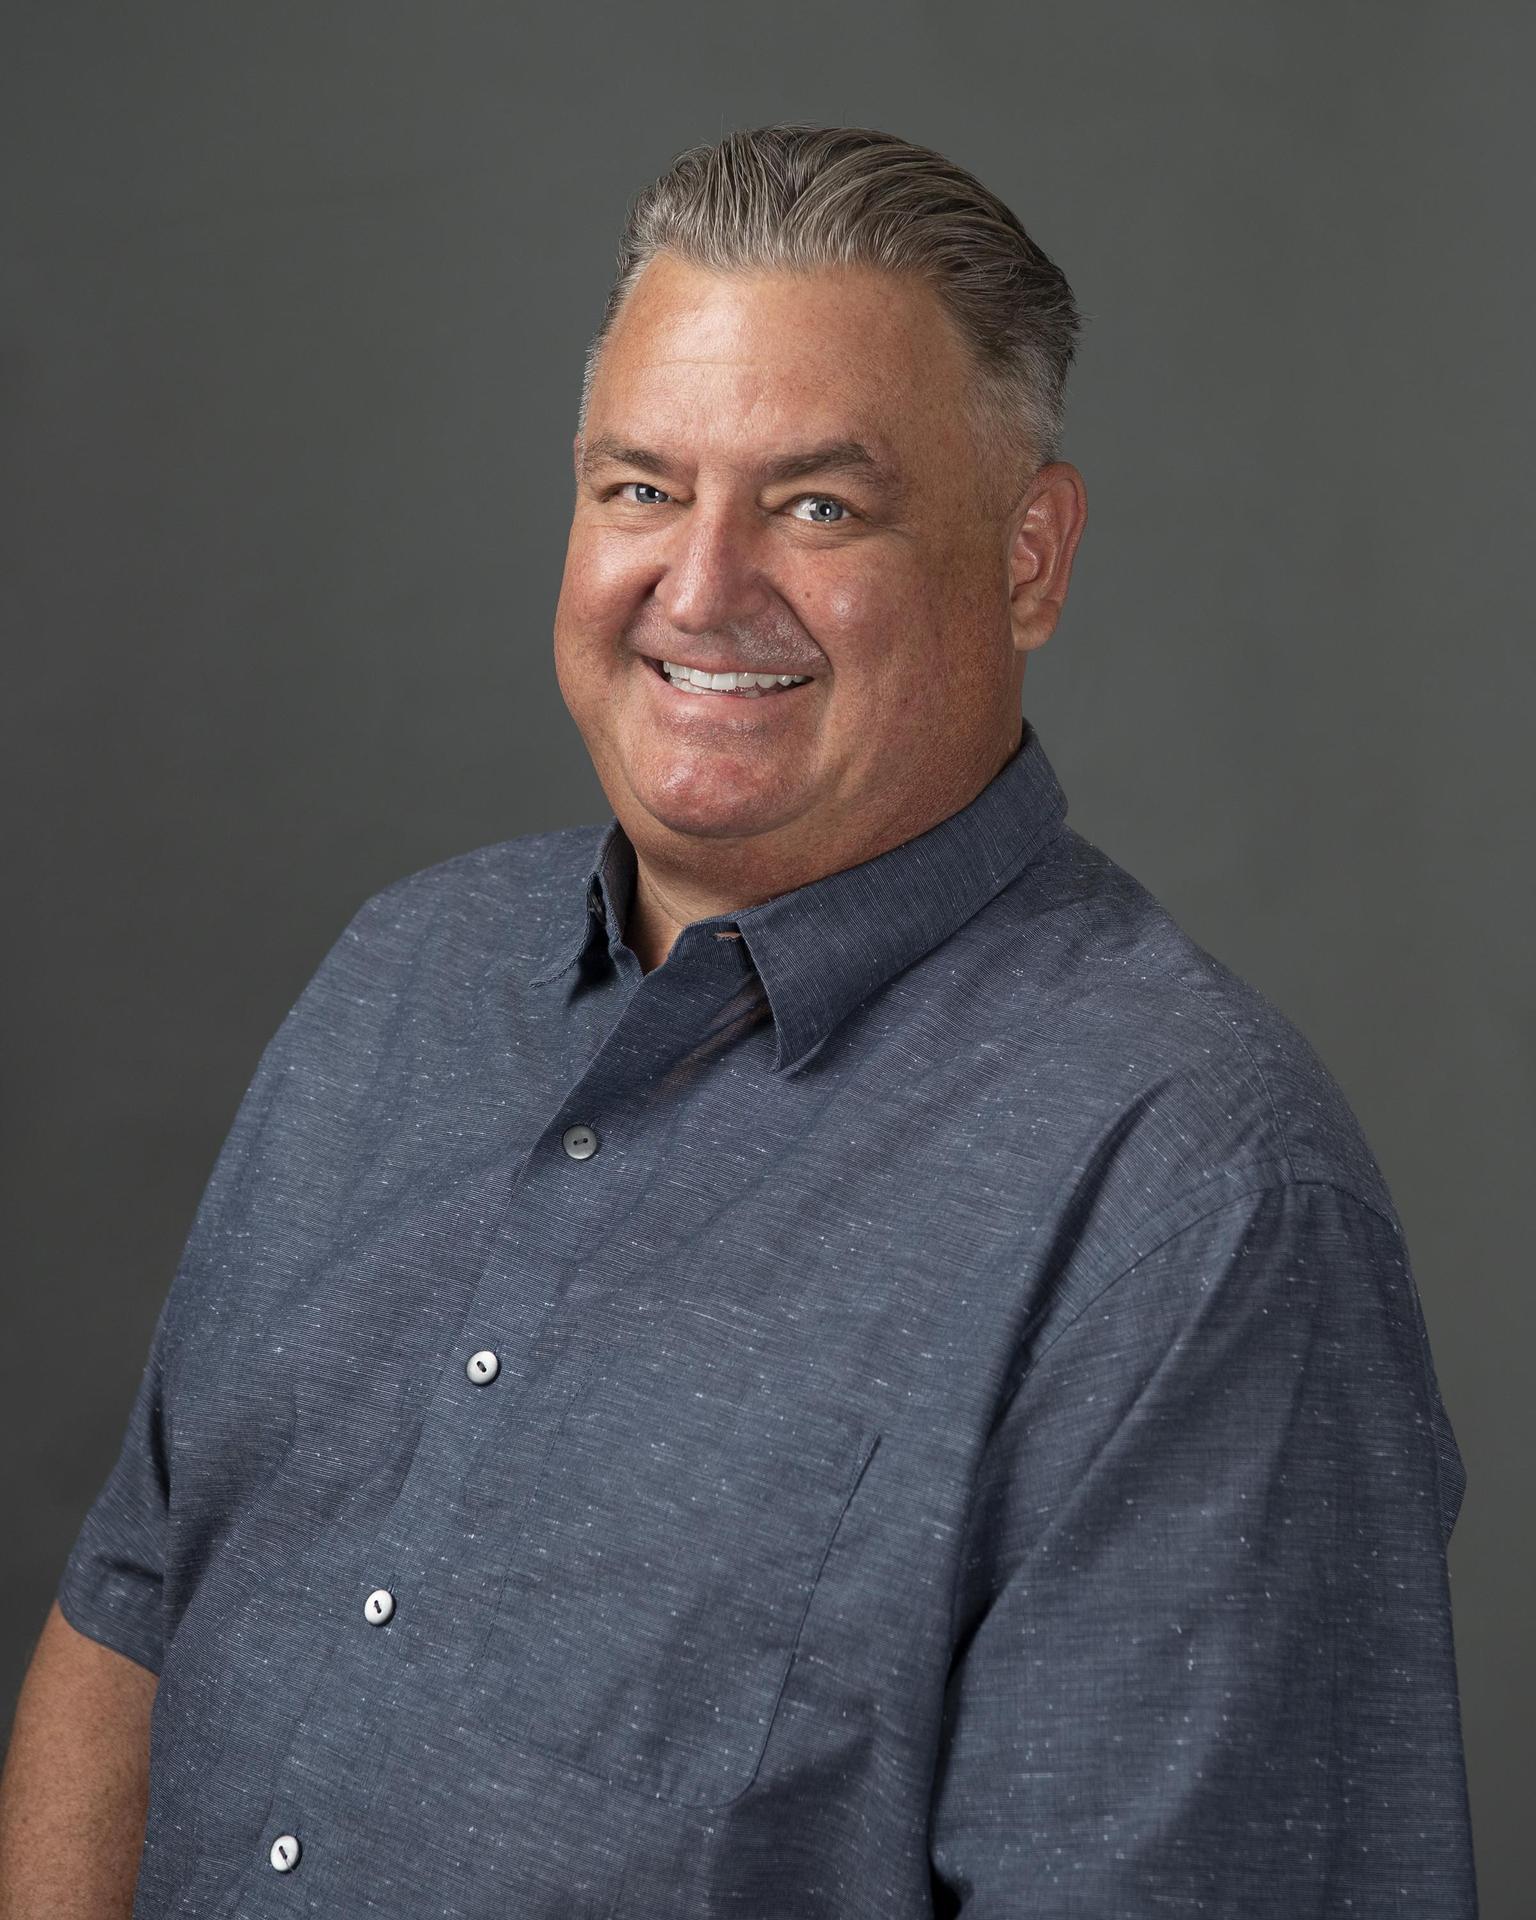 Mike Weaver